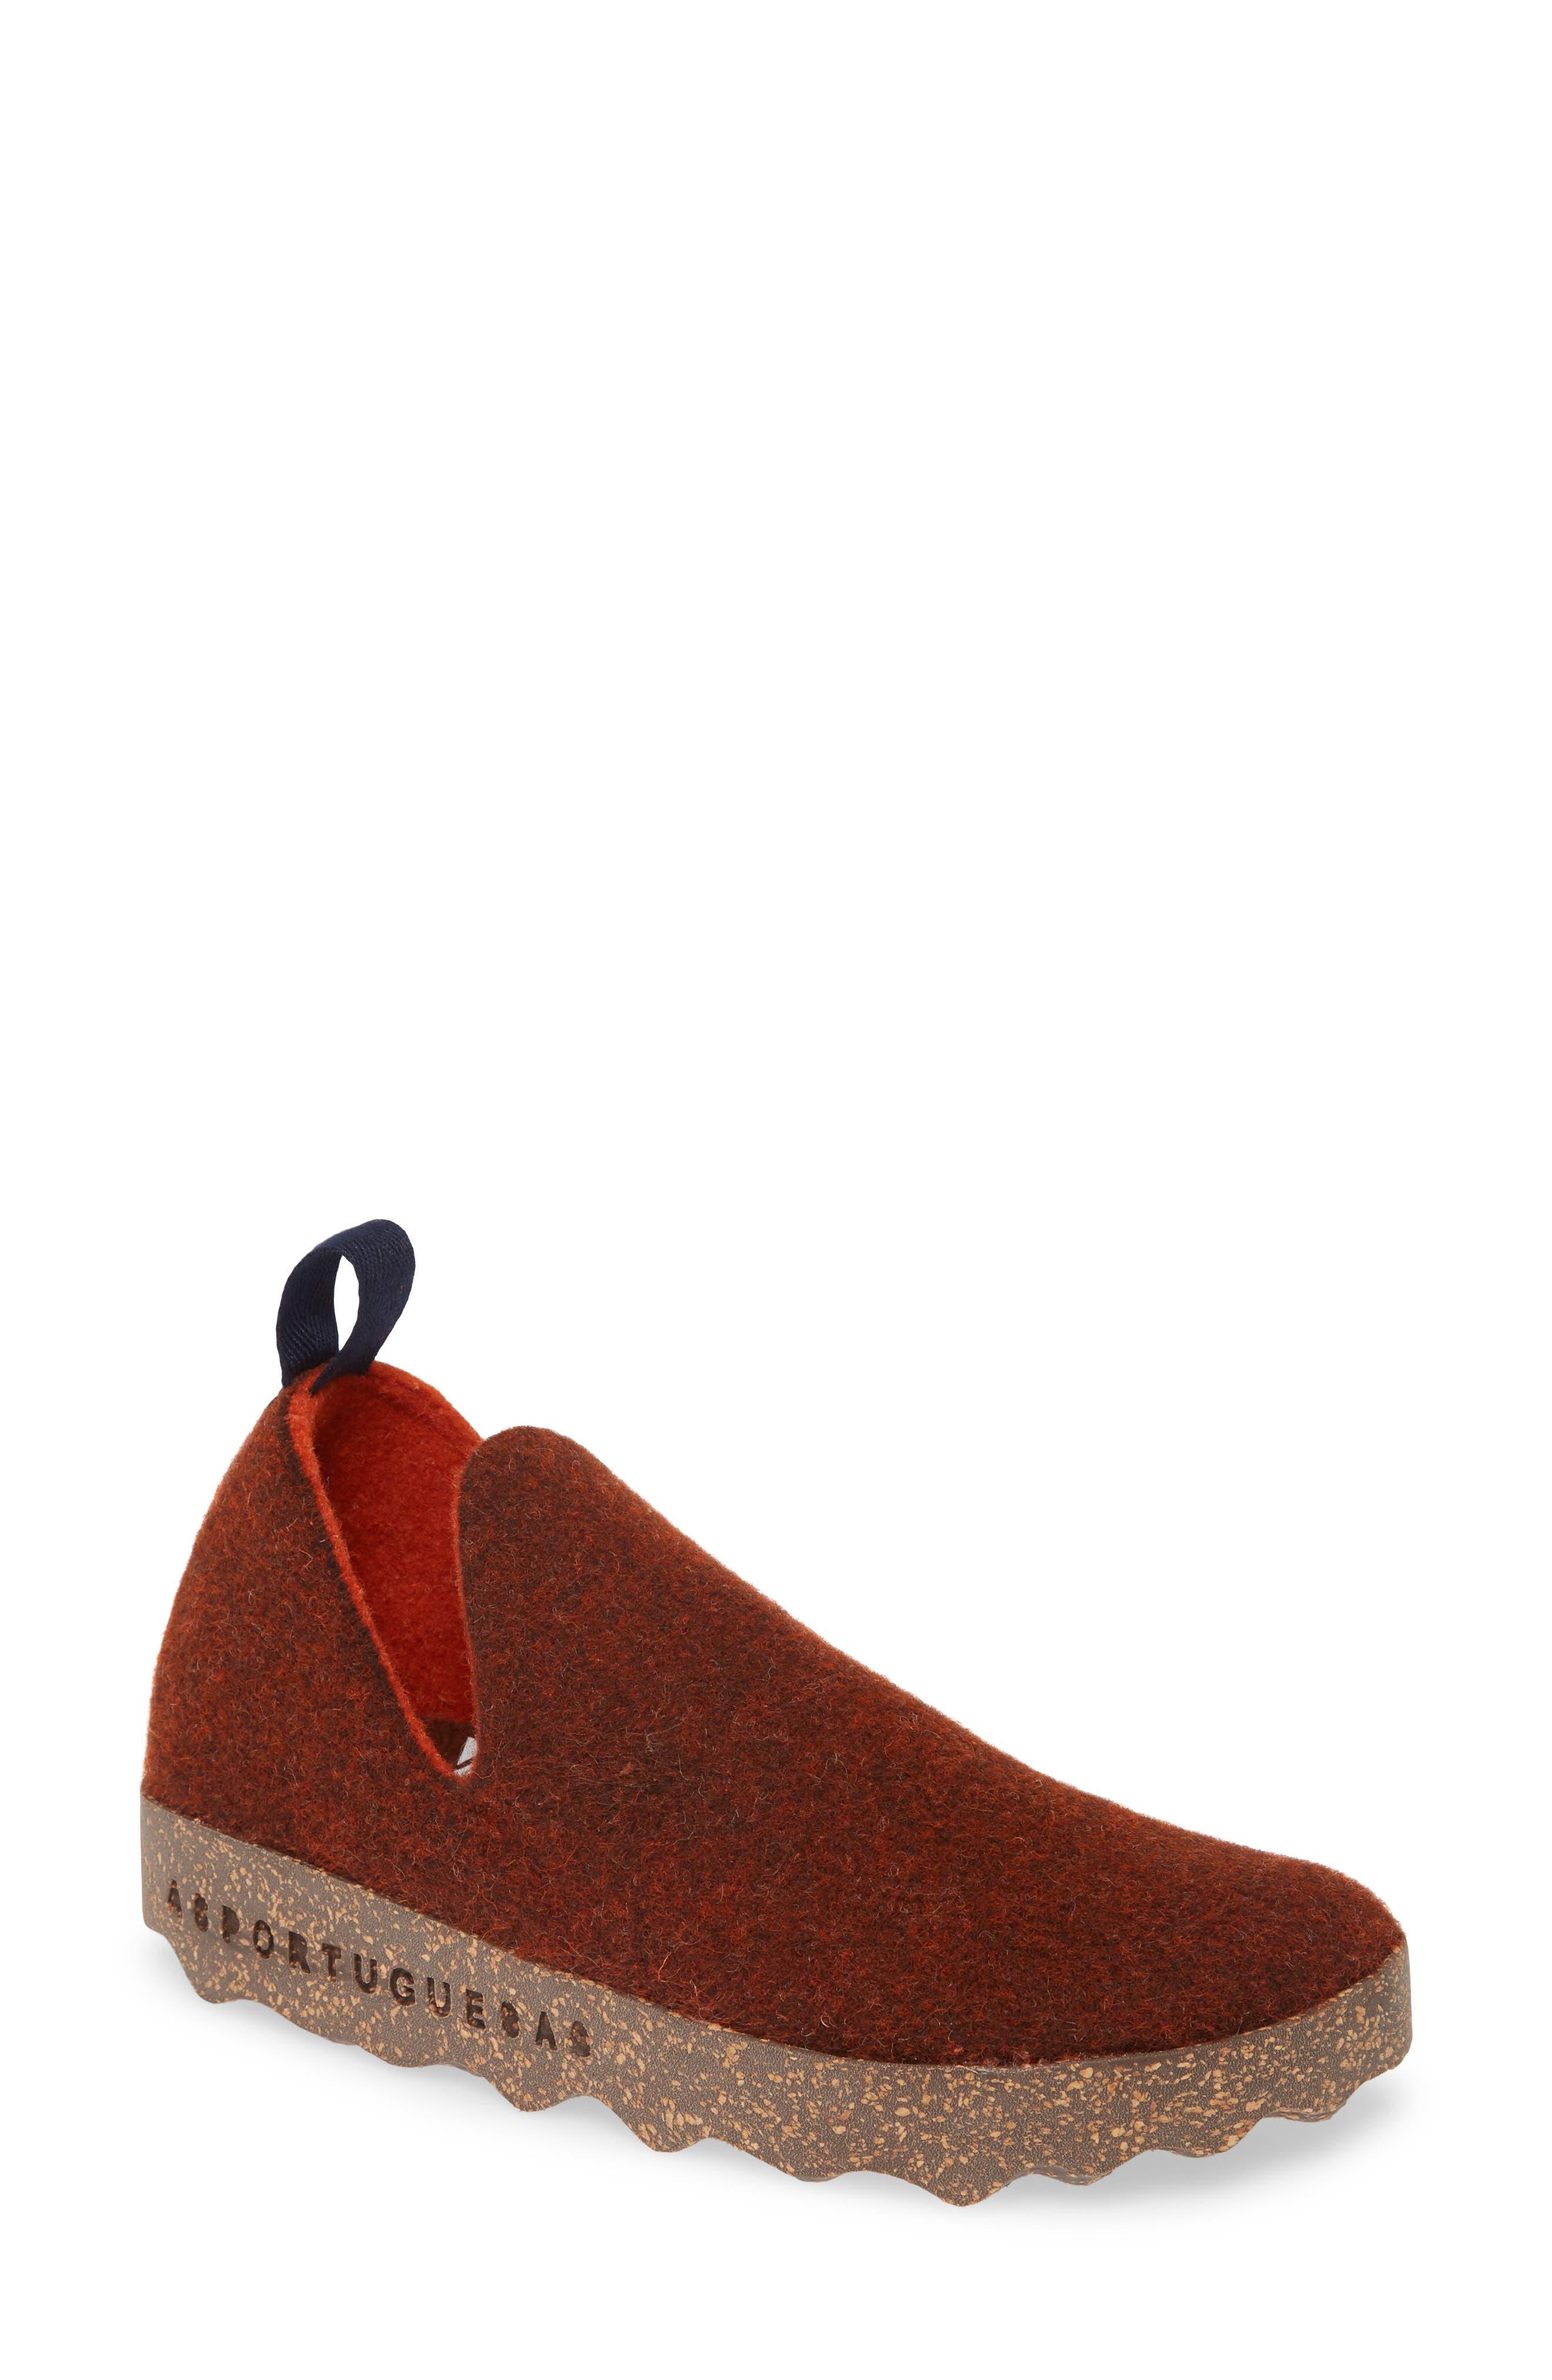 Asportuguesas By Fly London City Sneaker - Orange